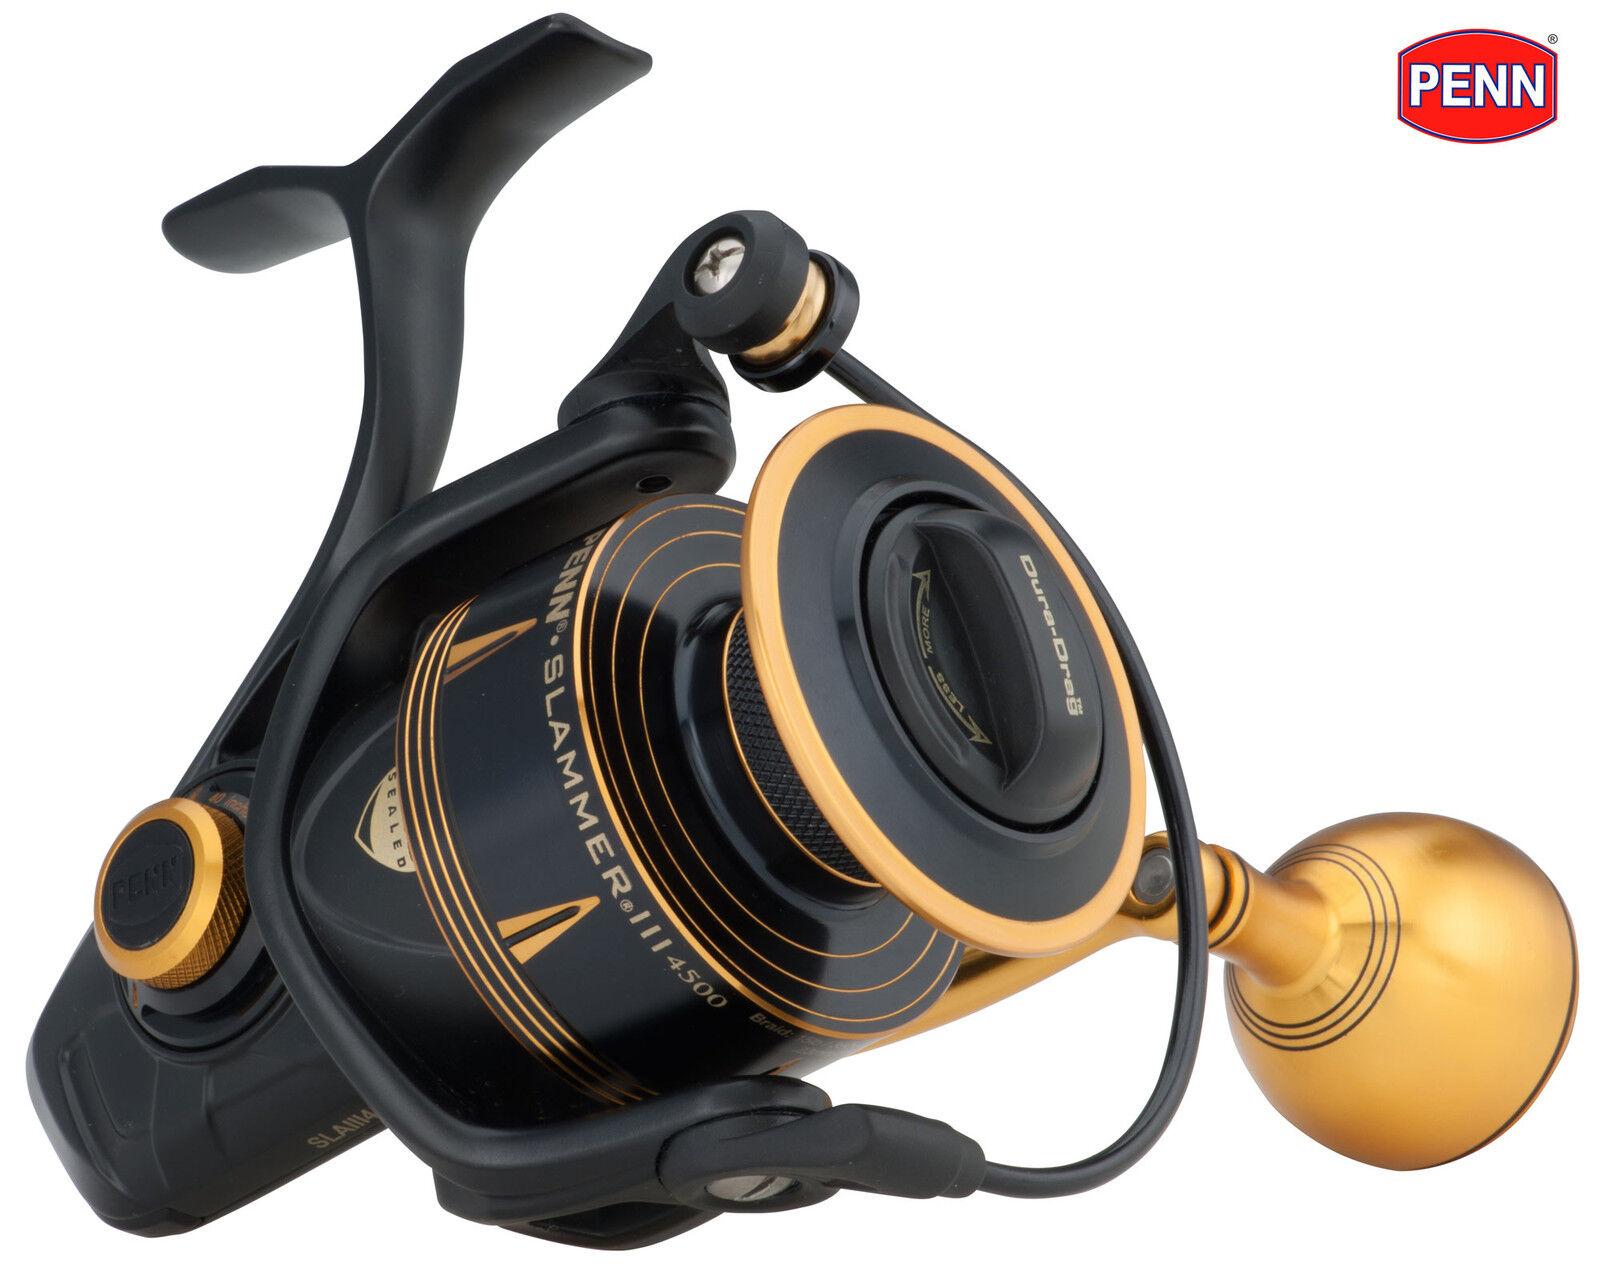 New PENN  Slammer III Mk3 Saltwater Spinning Reels - All Models Available  new style